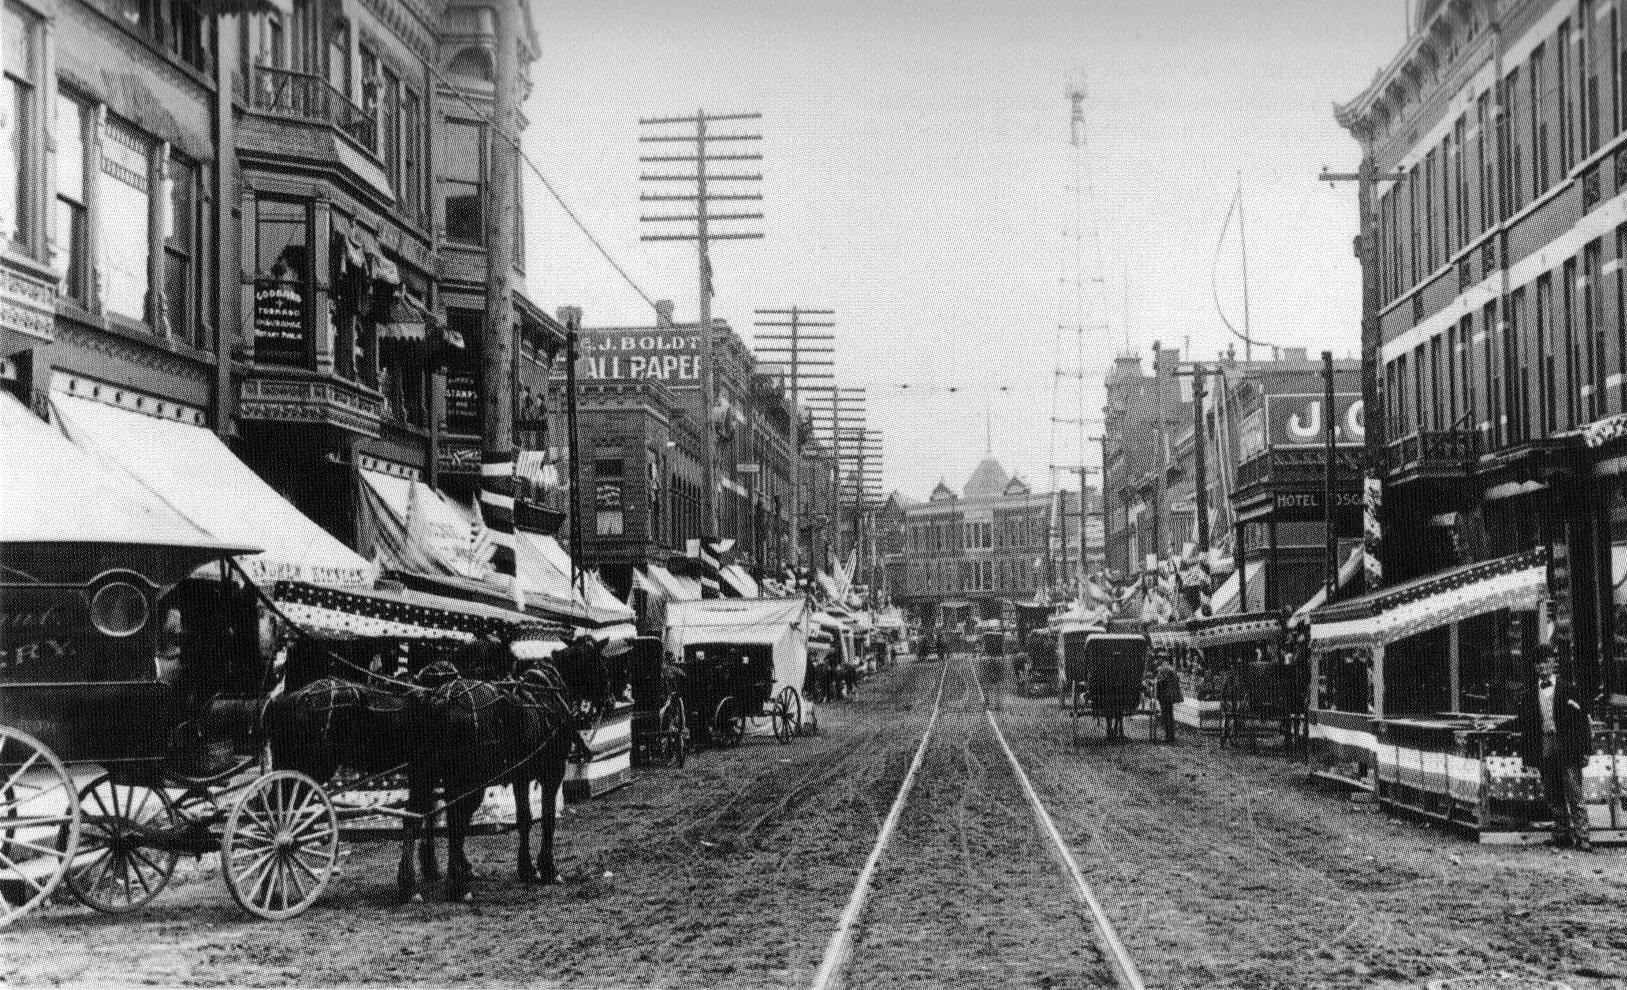 Larkin's-Children-Home-Street-Carnival-Benefit-1901.jpg